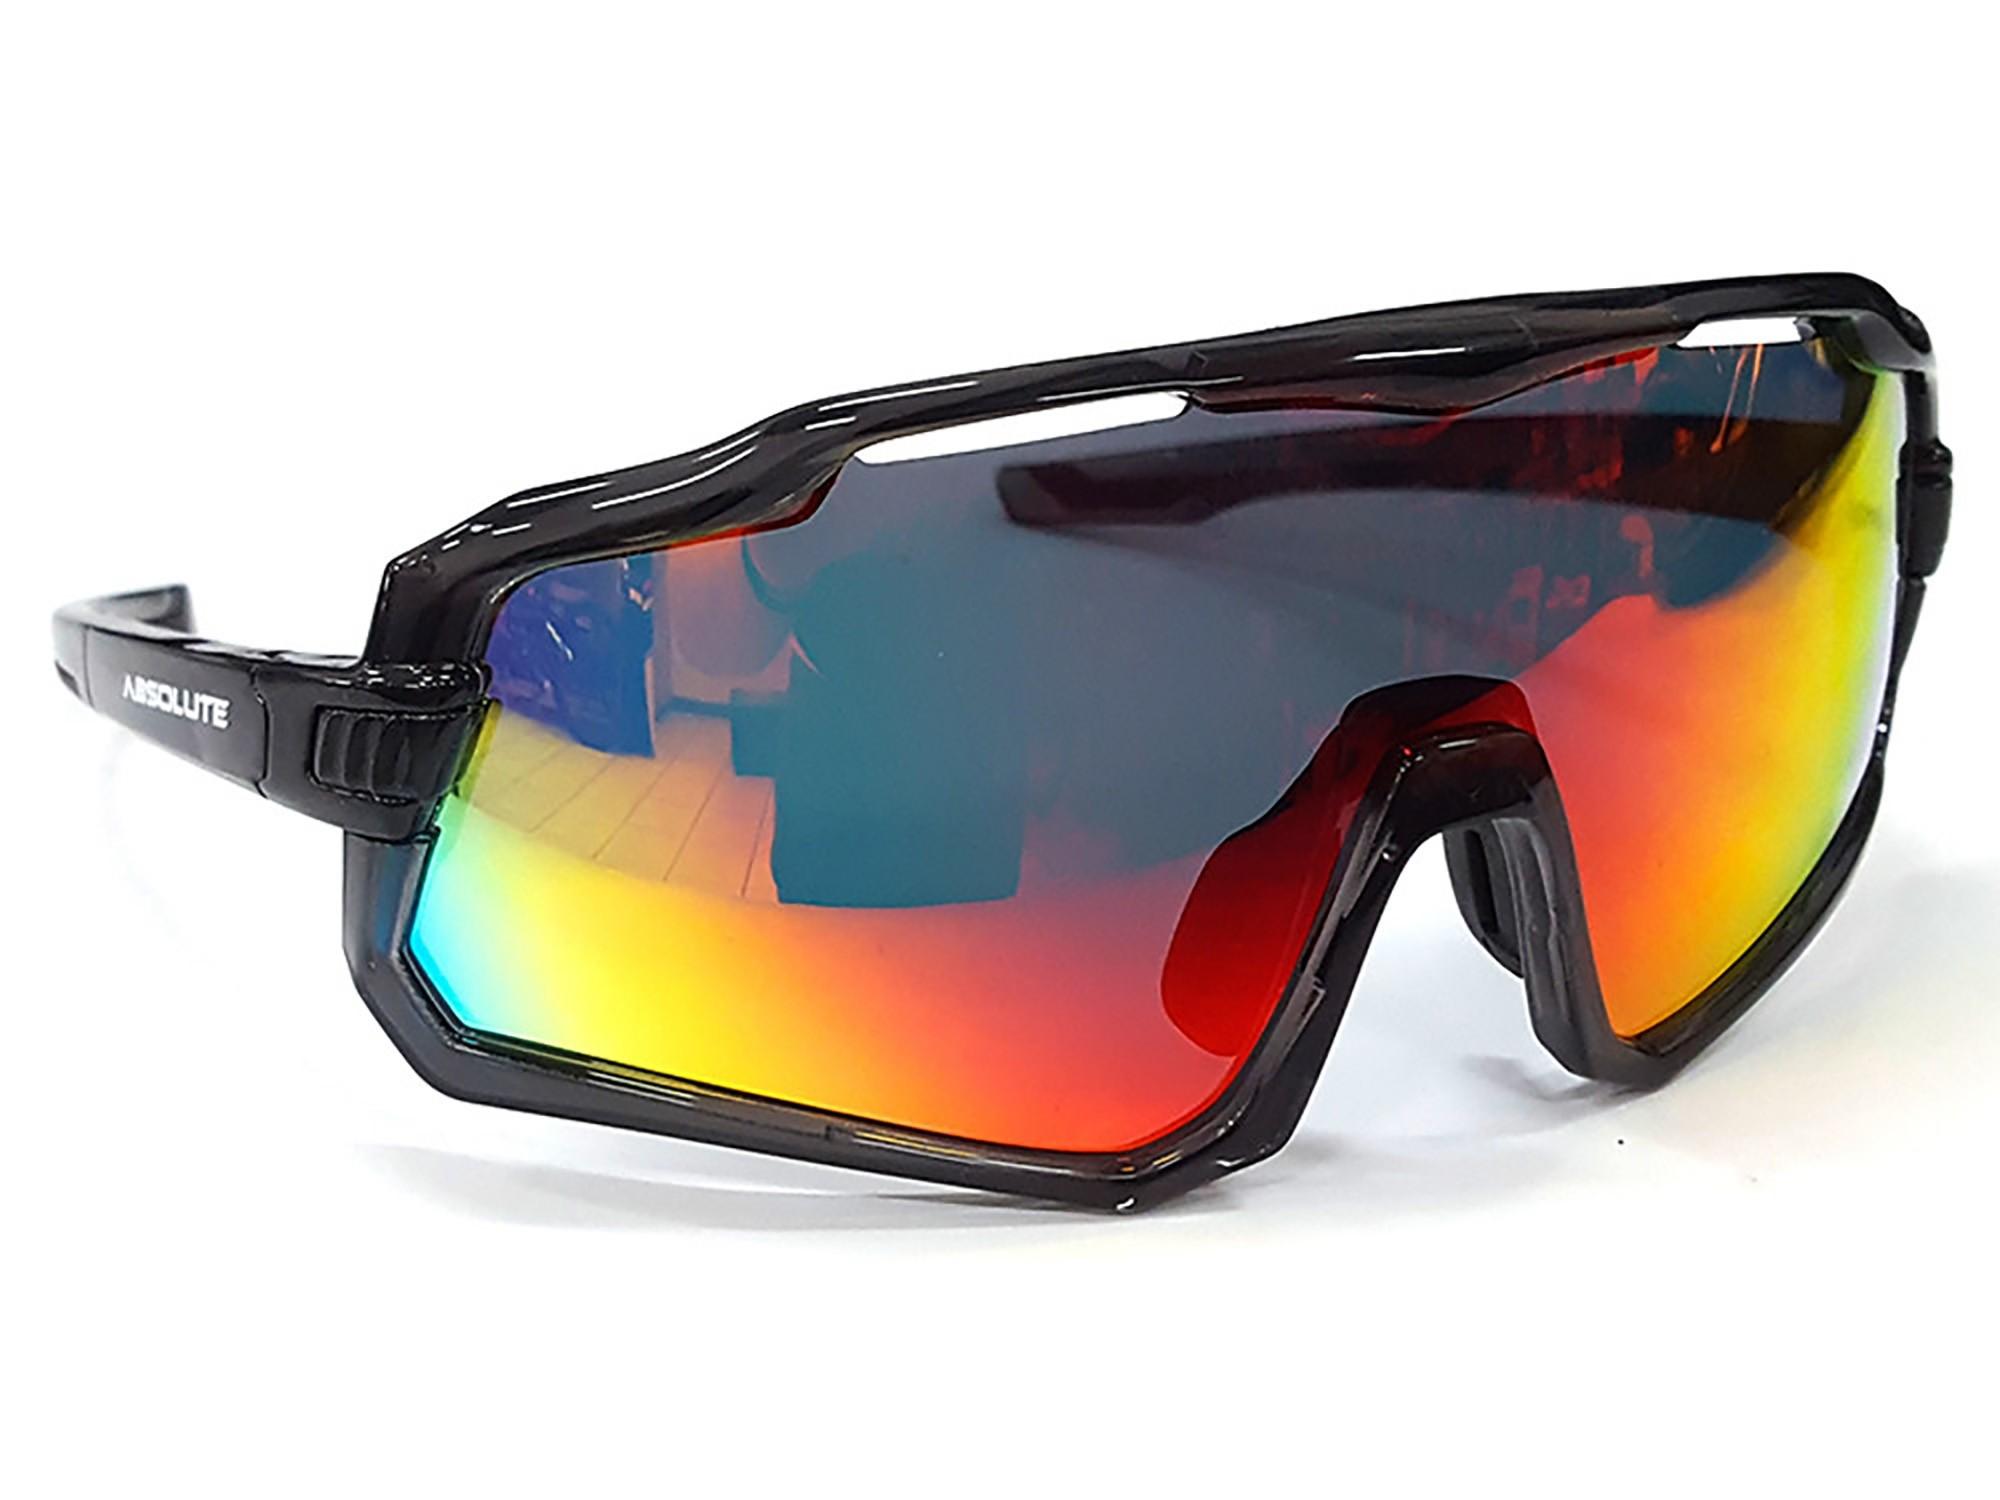 Oculos Ciclismo Wild Diversas Cores - Absolute